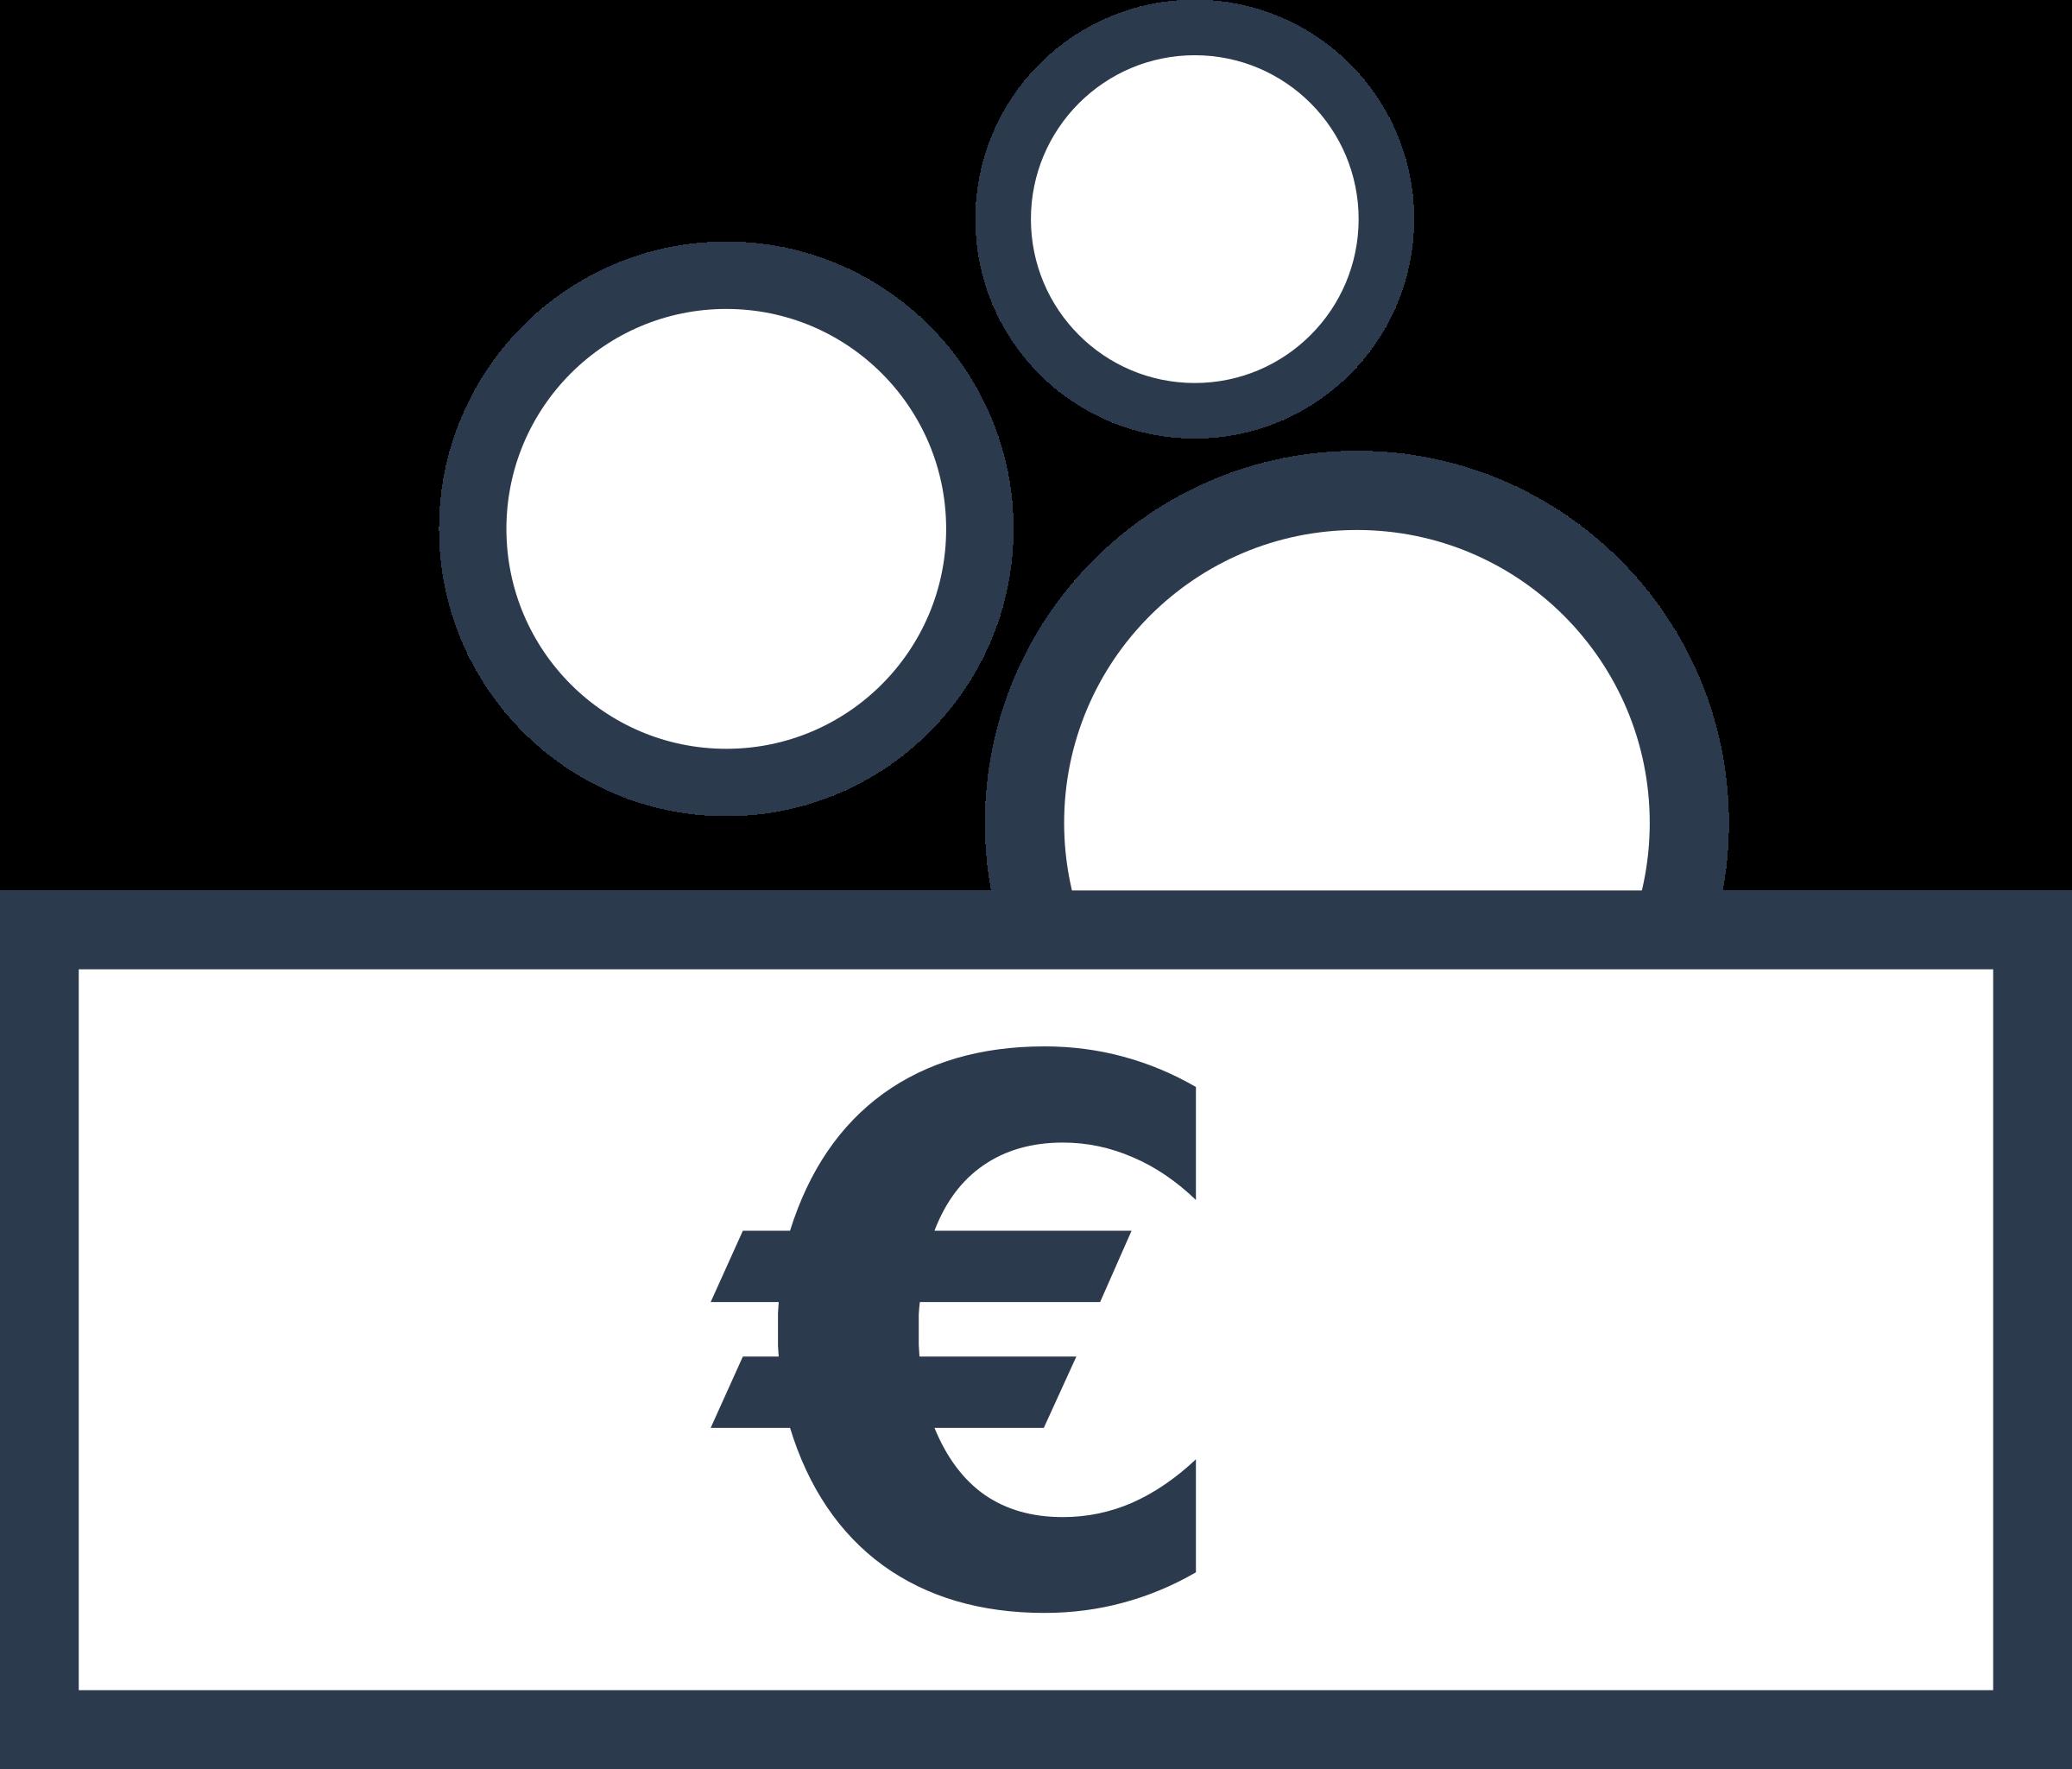 Clipart Money Symbol